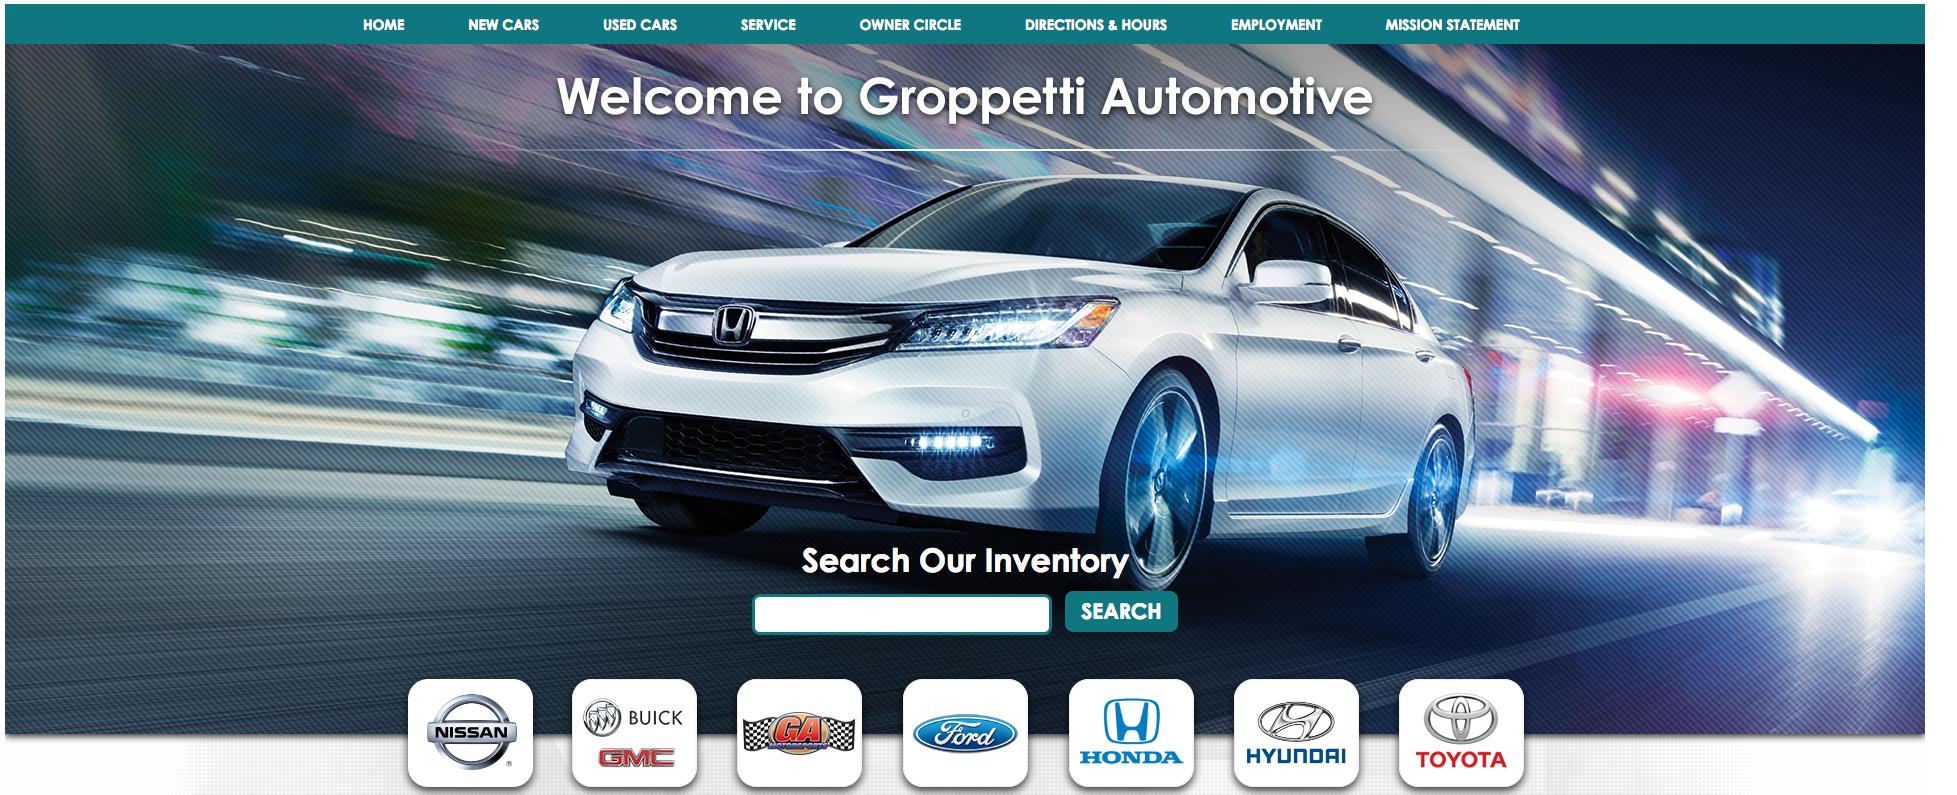 Groppetti Automotive | Cal Bennetts testimonial